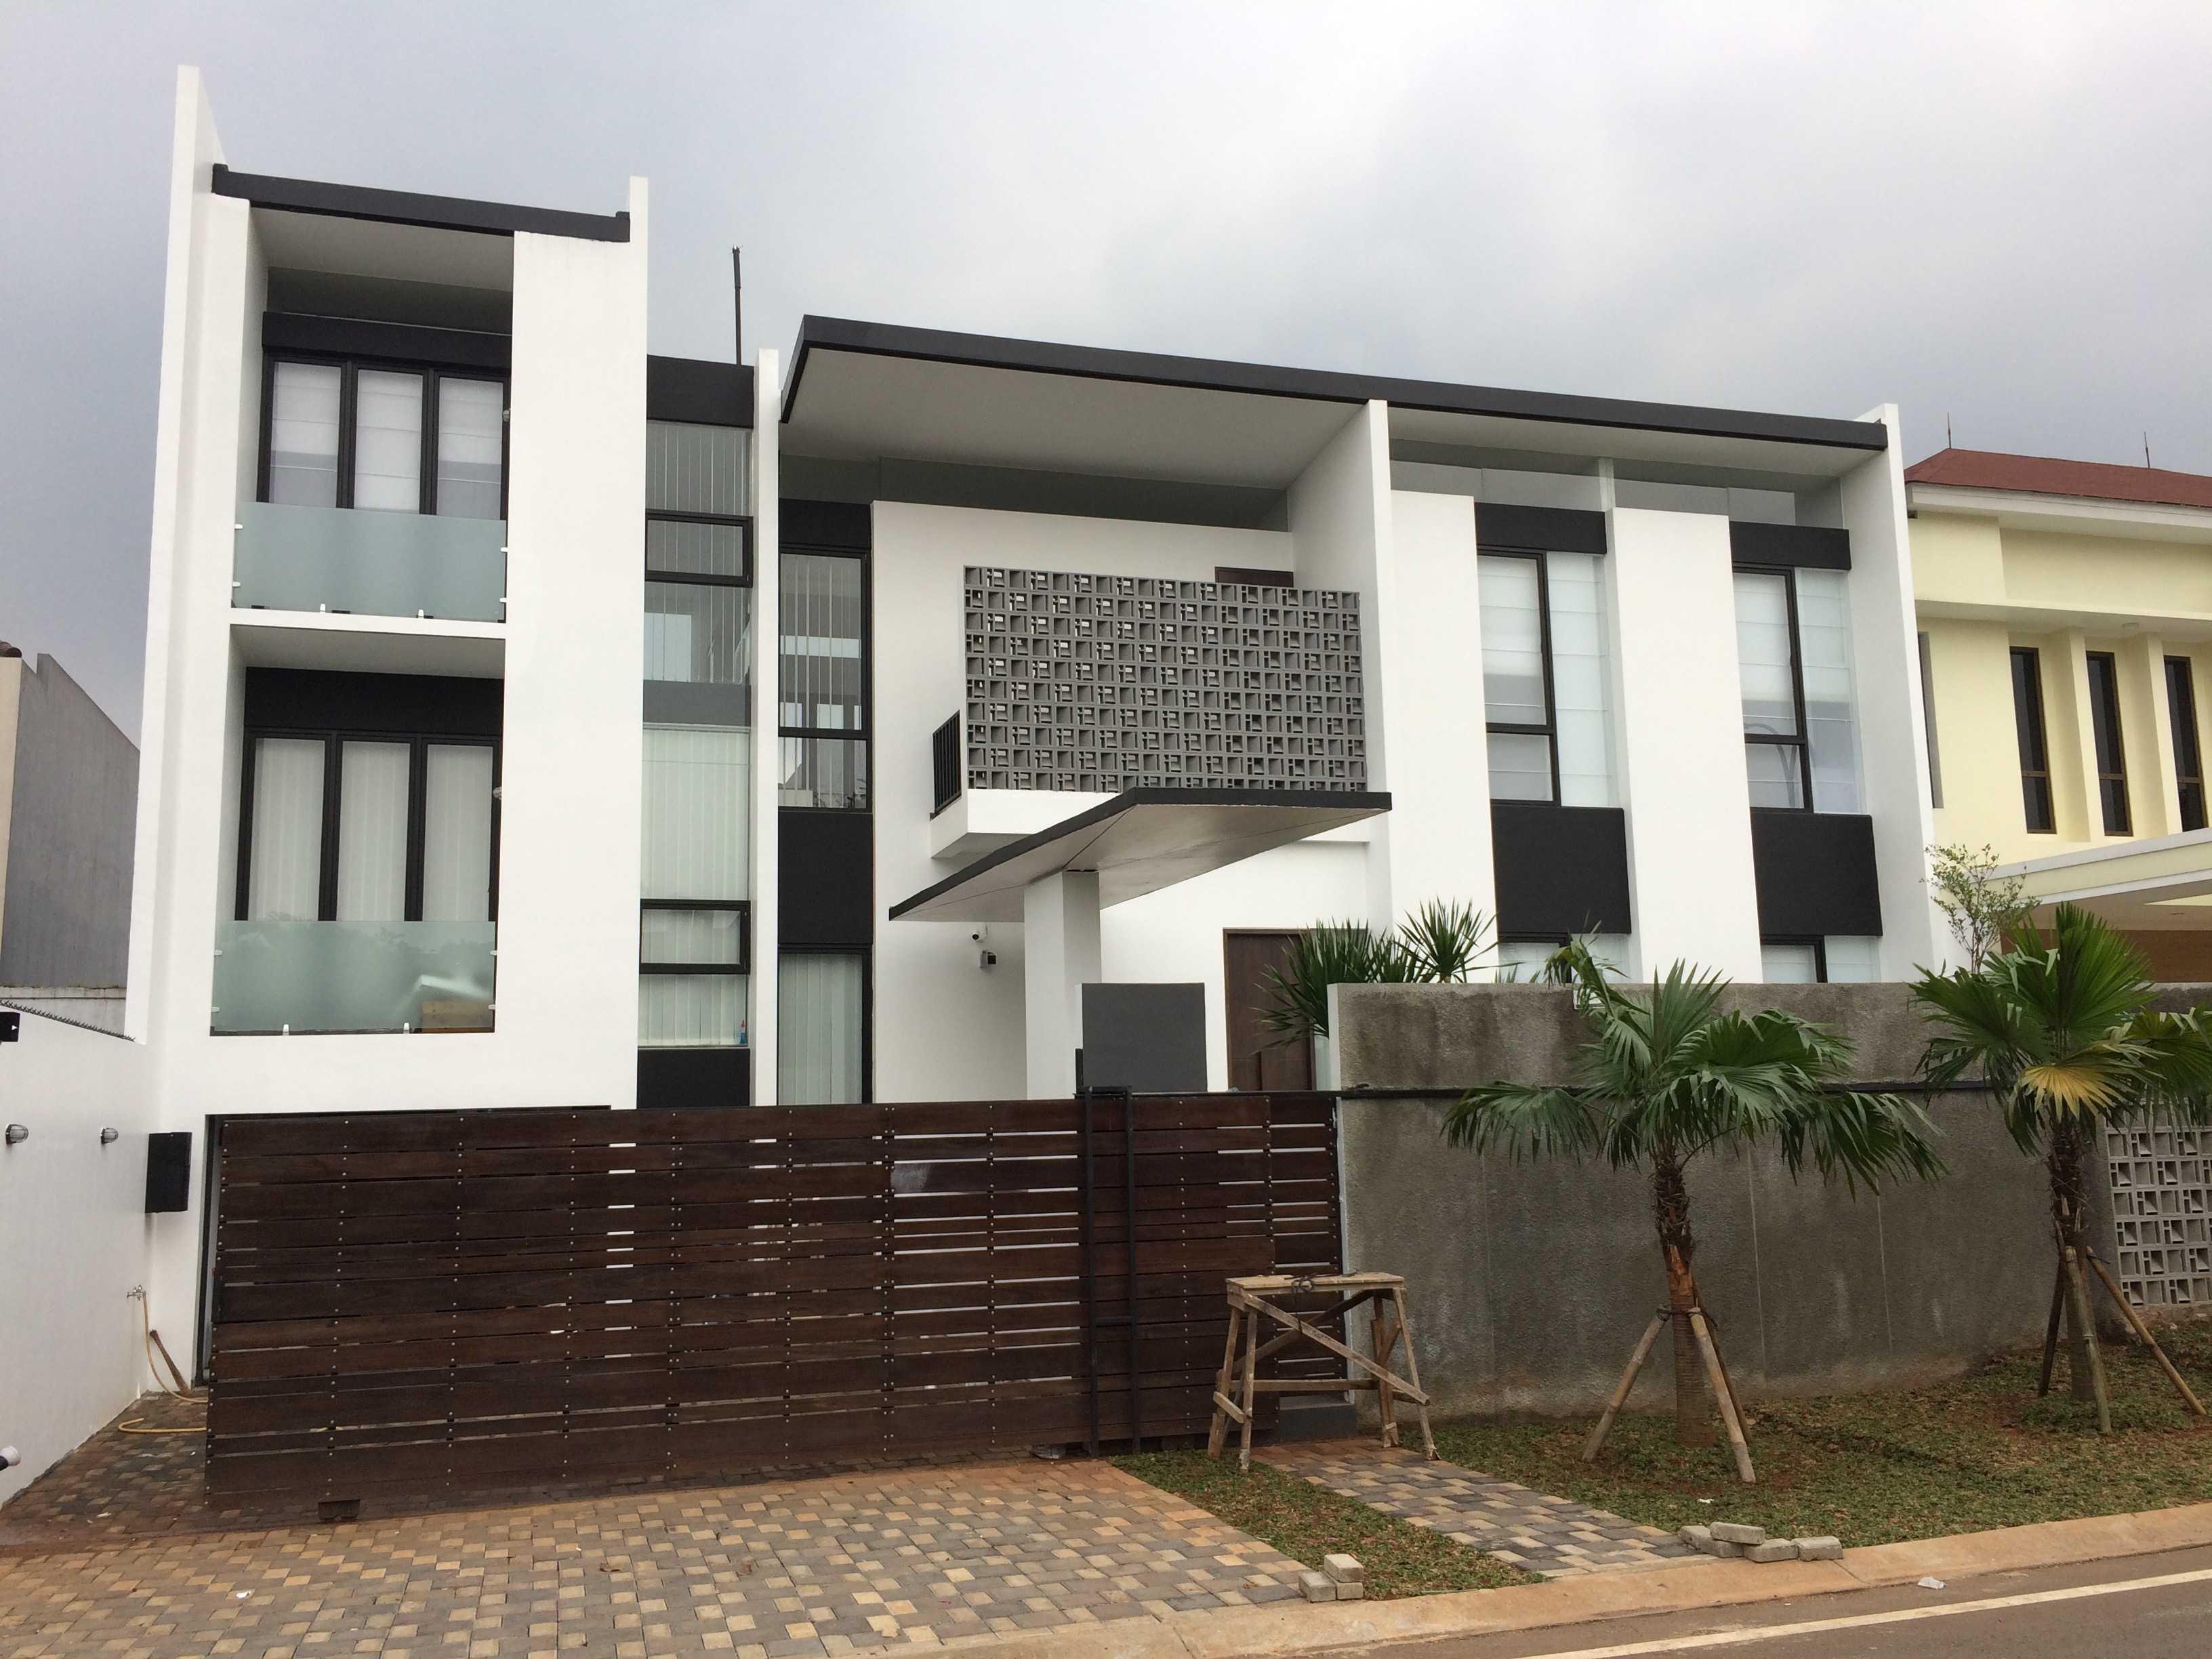 Jerry M. Febrino Rs House Jl. Pesona Paris, Ciangsana, Gn. Putri, Bogor, Jawa Barat 16968, Indonesia Kota Wisata Facade Modern  14913